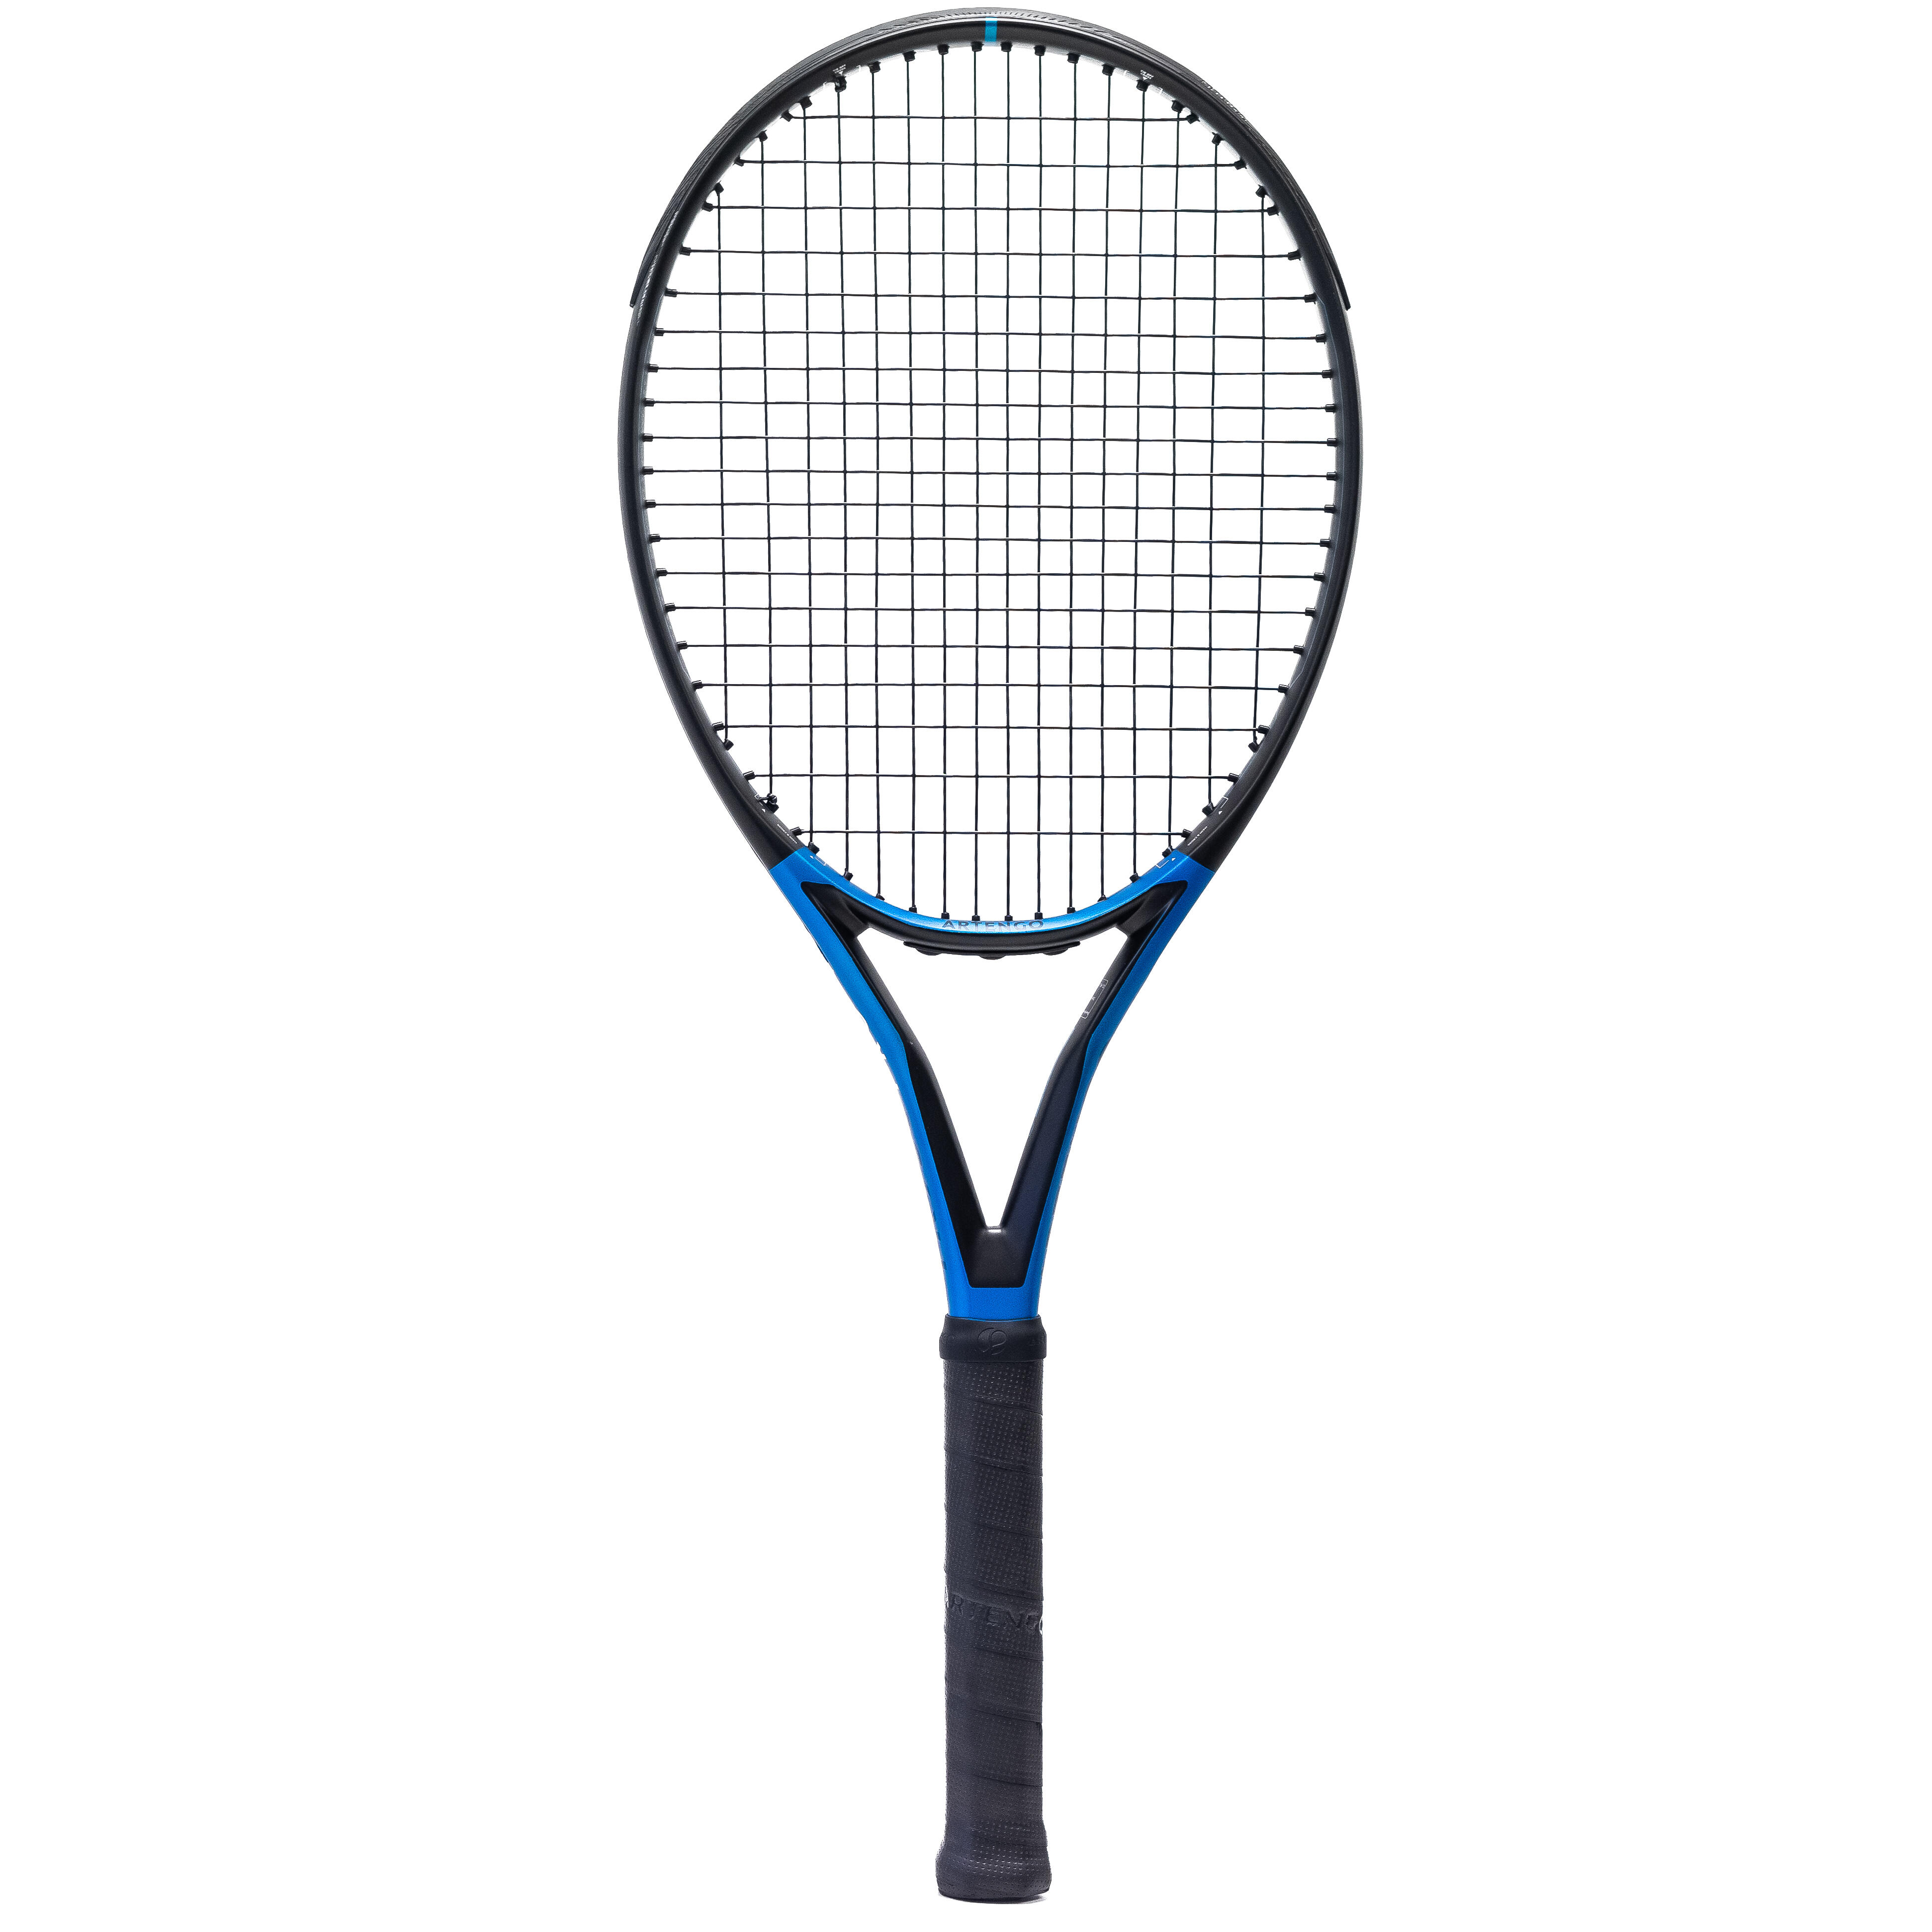 Rachetă Tenis TR930 SPIN LITE